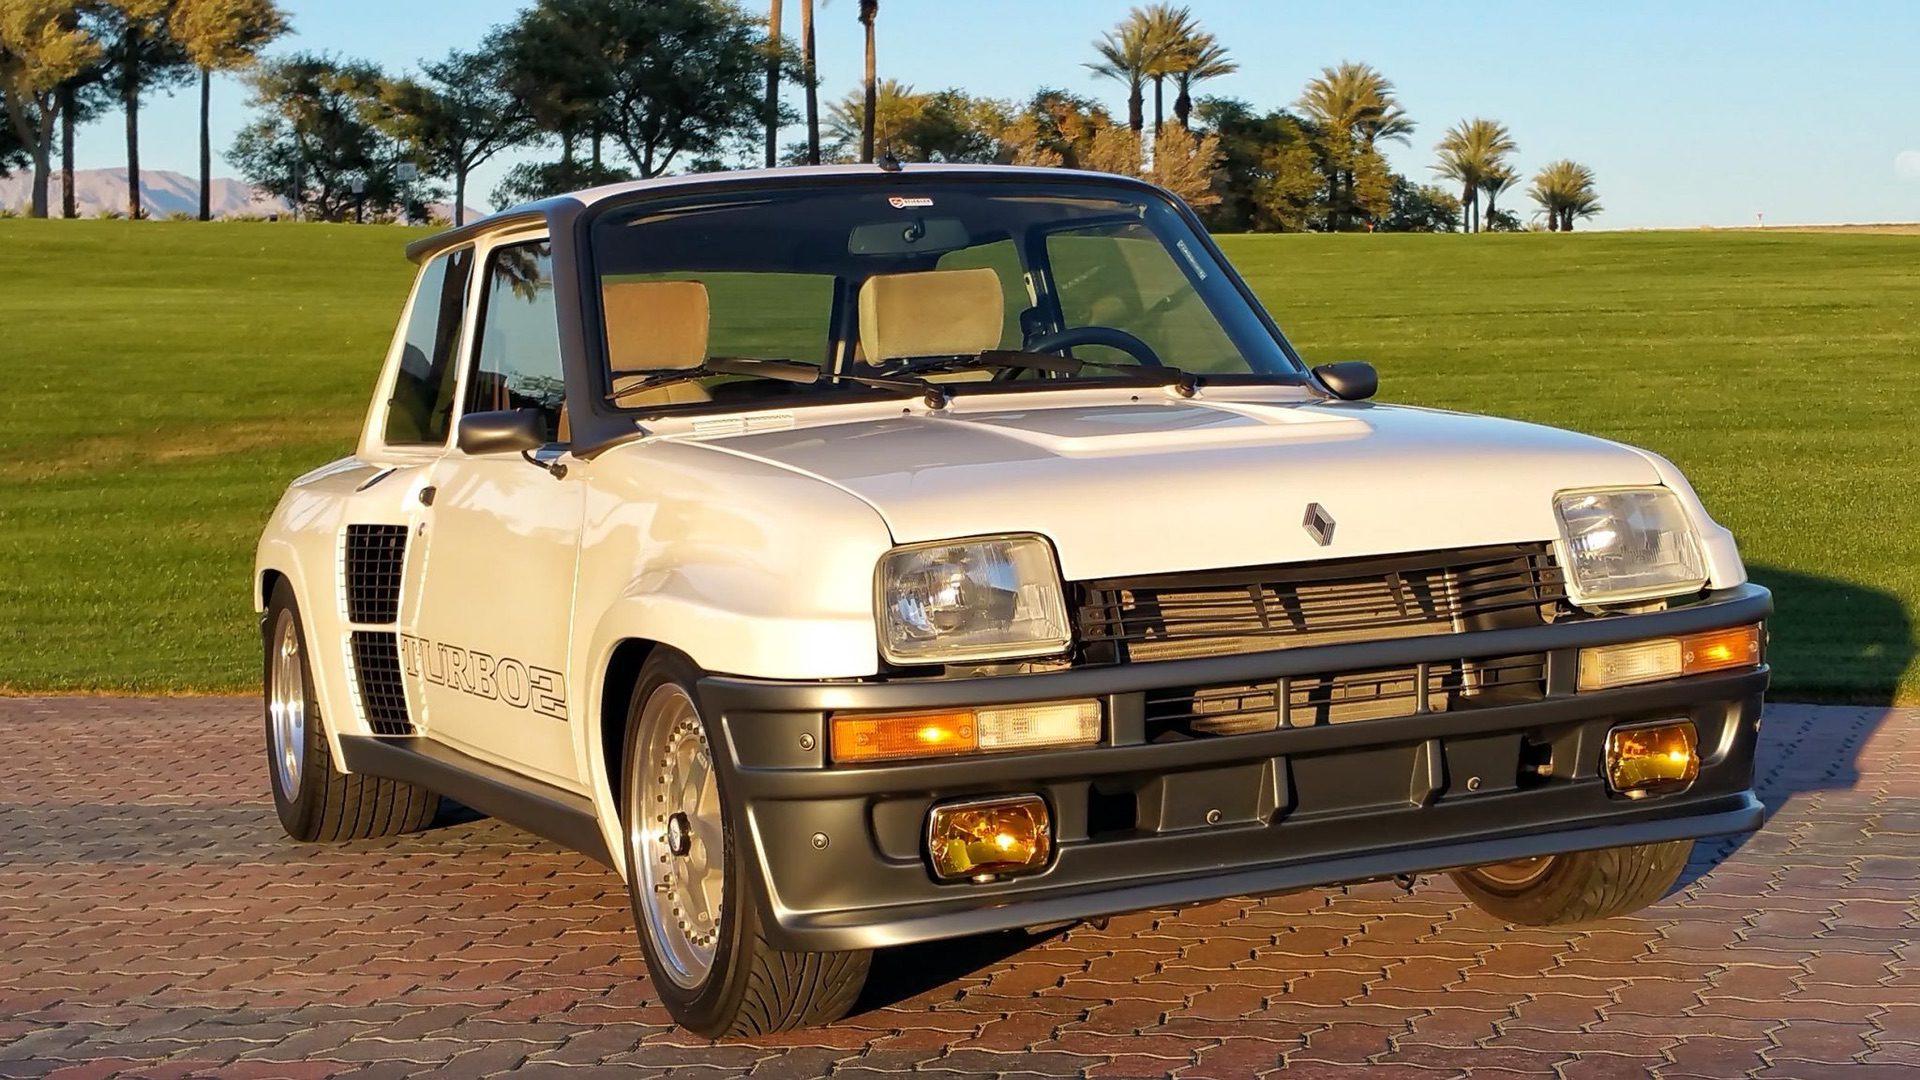 1985_Renault_R5_Turbo_2_rotary-0033